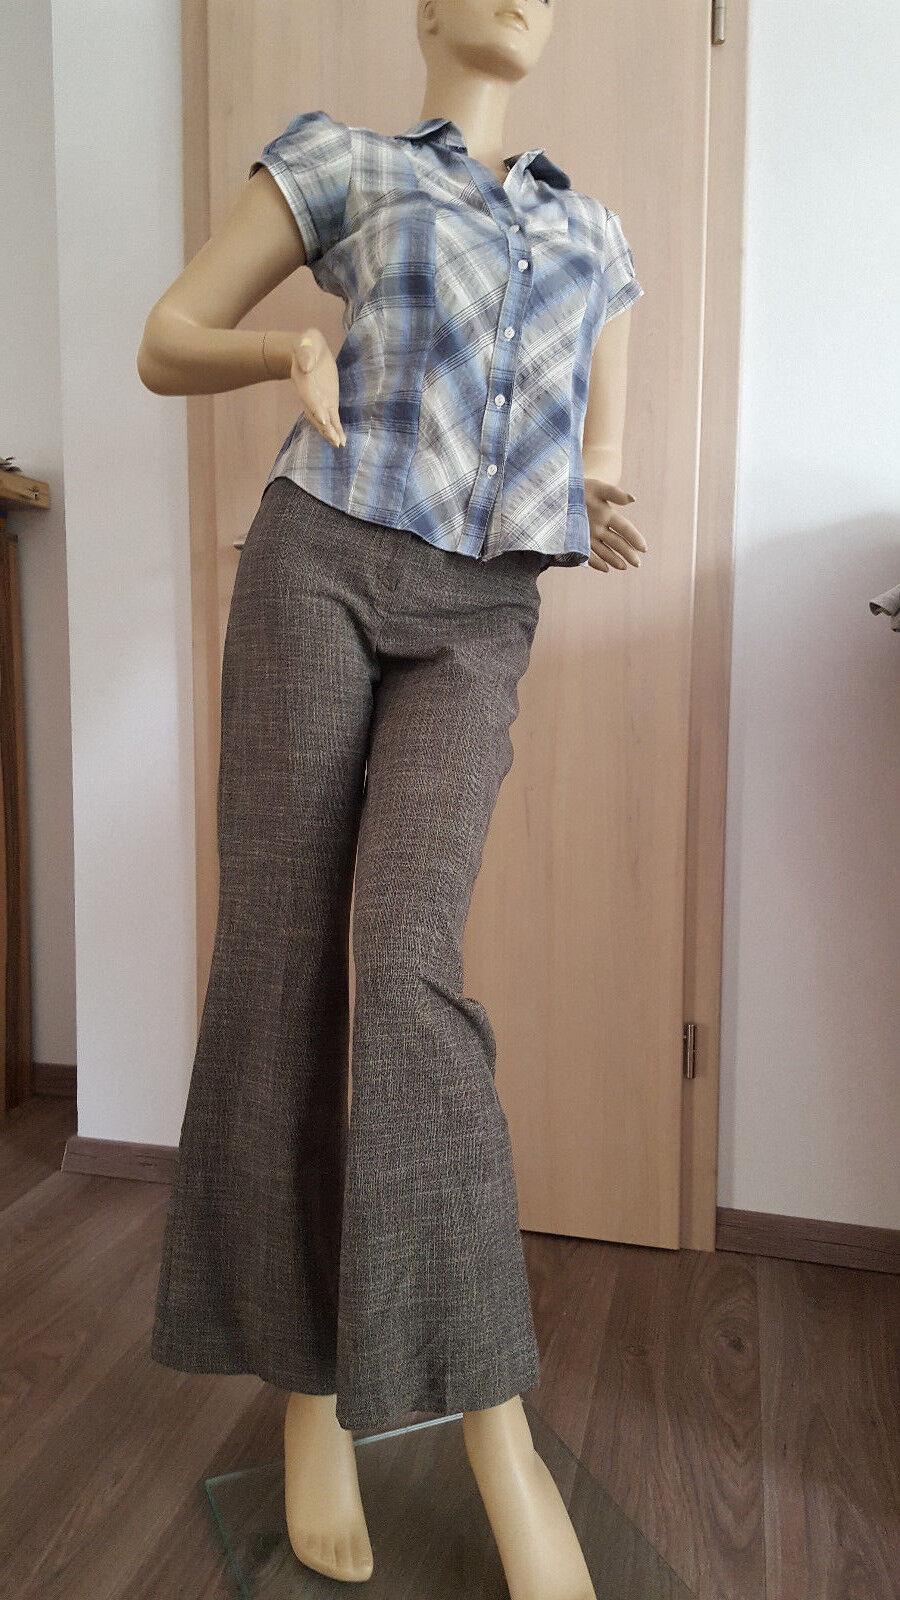 Damenhose von NEXT, schwarz-grau, Gr. 36 38 (8R), aktuelle Kollektion. NEU